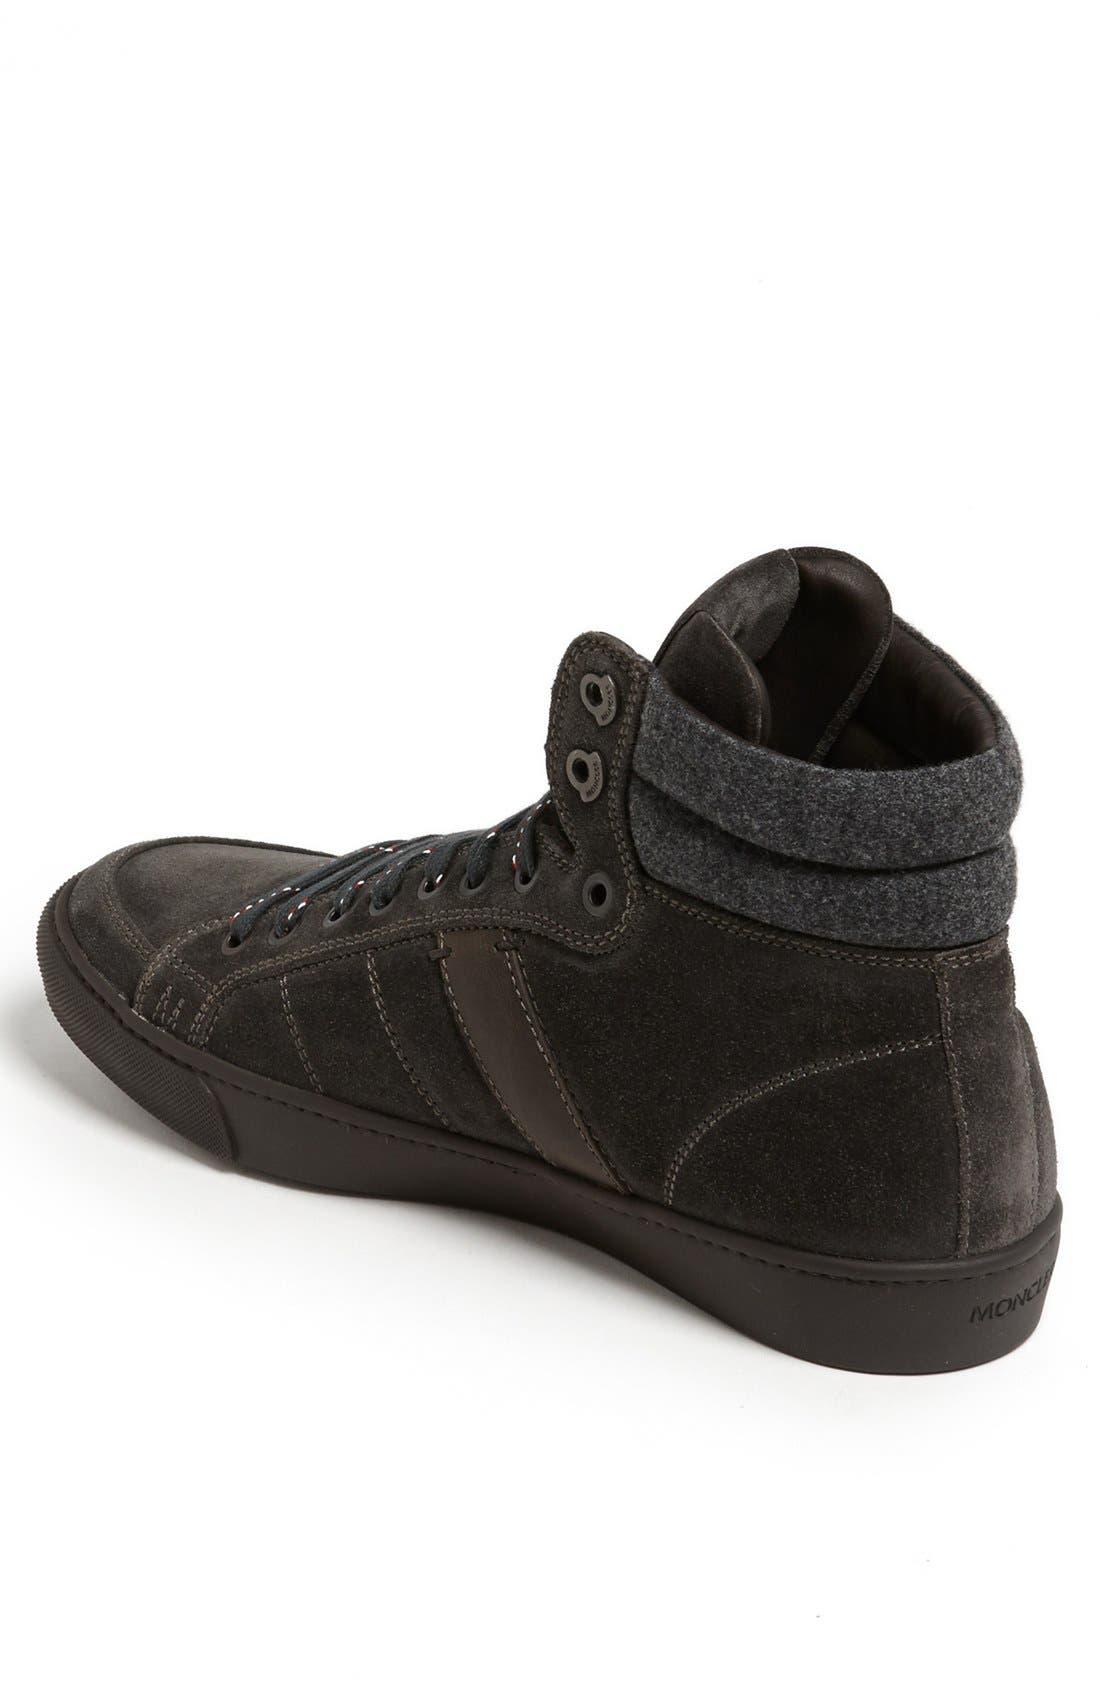 Alternate Image 2  - Moncler 'Lyon' Suede Sneaker